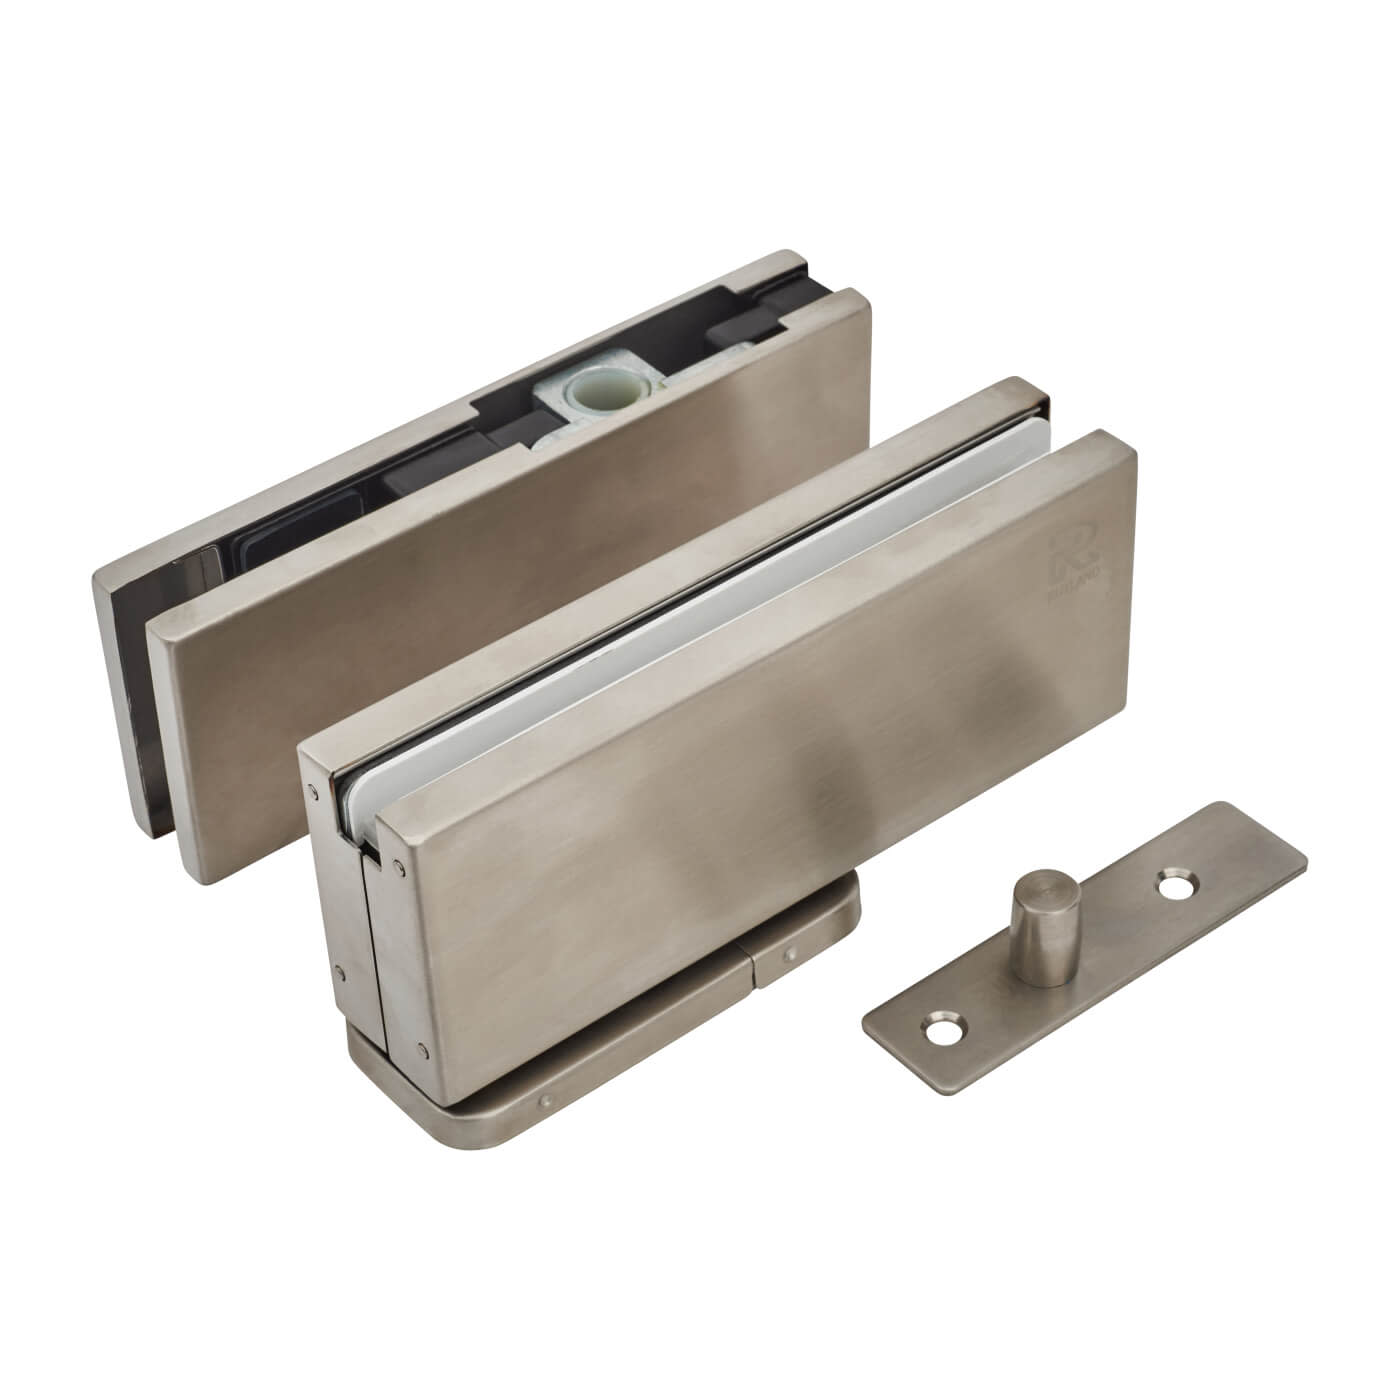 Rutland® Hydraulic Glass Patch Closer - 90 Degree Hold Open)